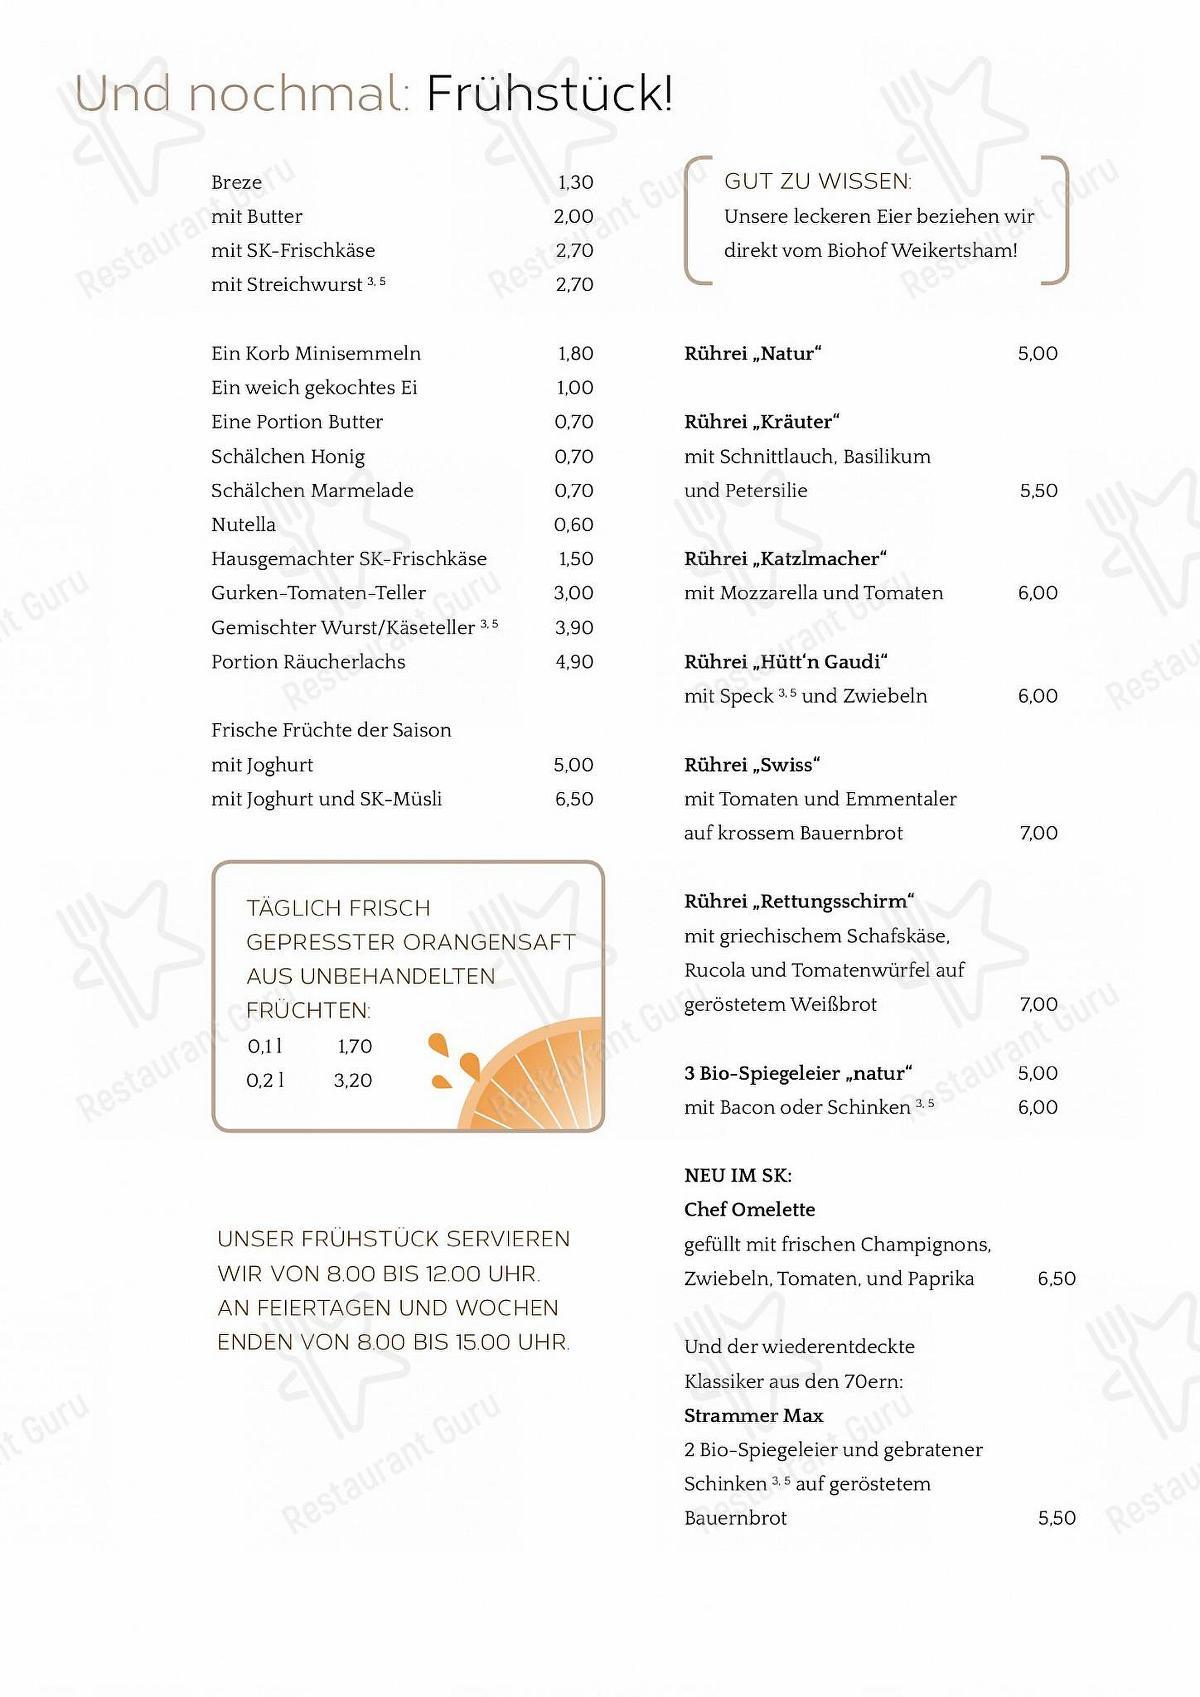 Stechl Keller menu